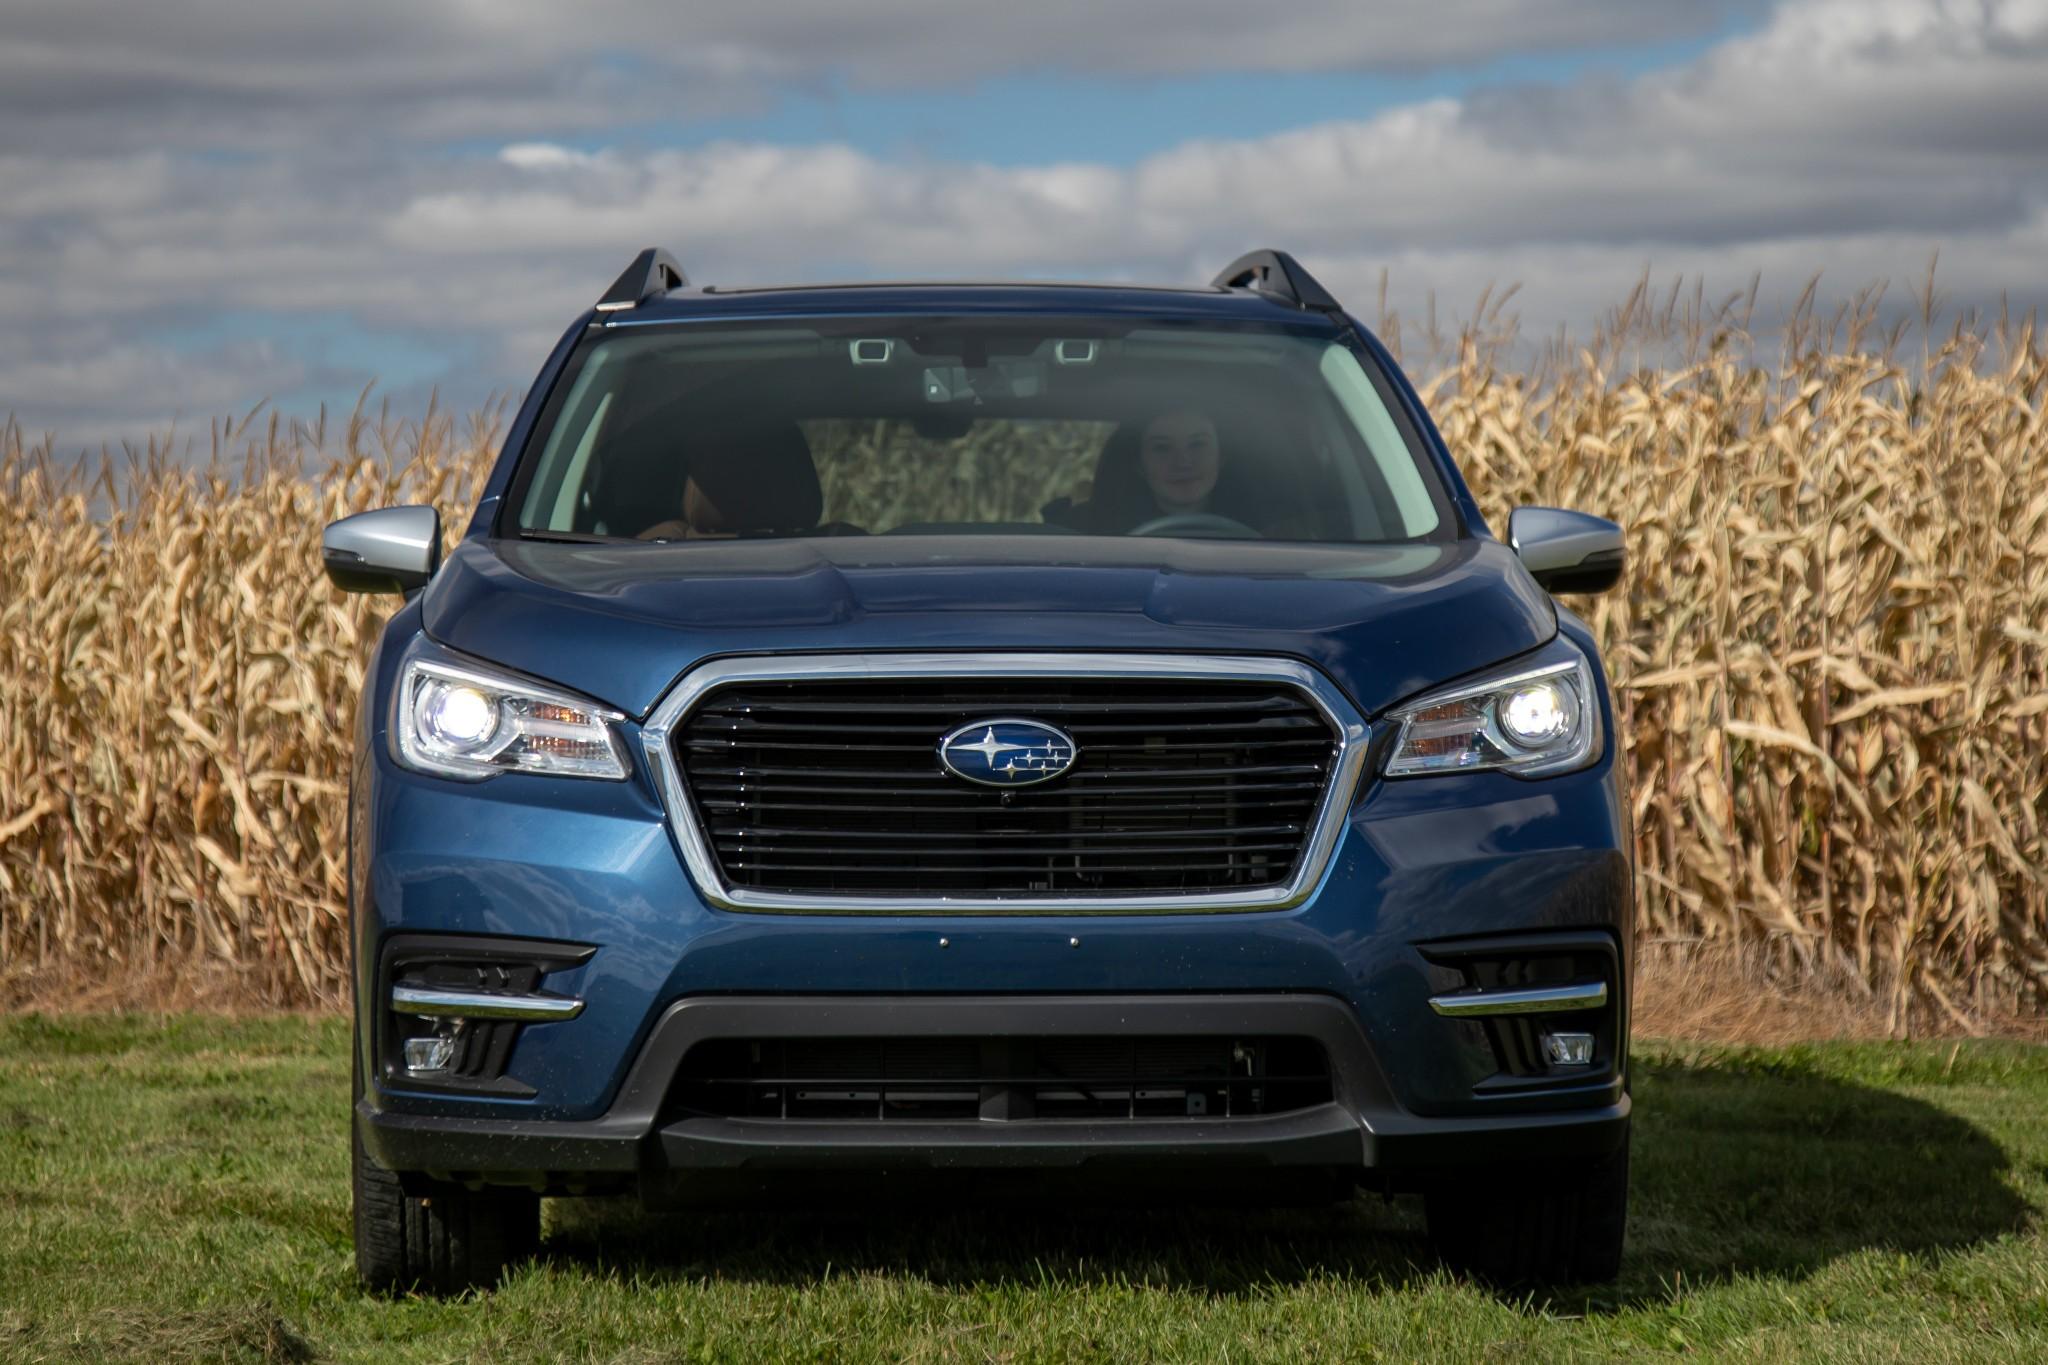 Who Makes Subaru?